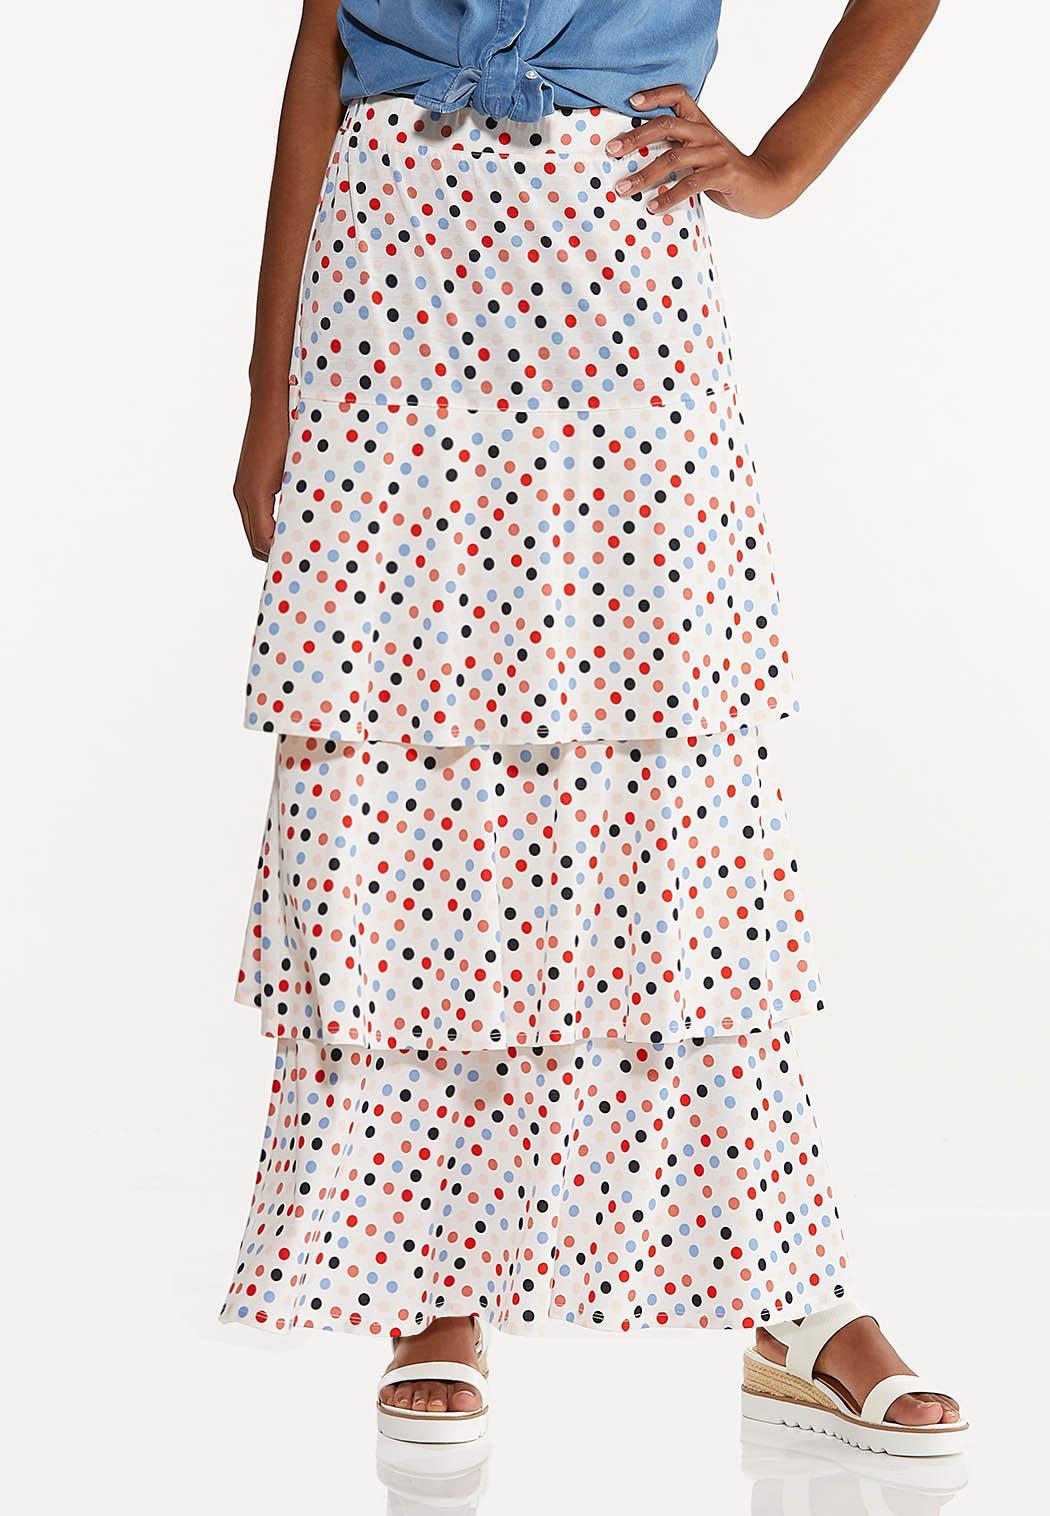 Plus Size Tiered Polka Dot Skirt